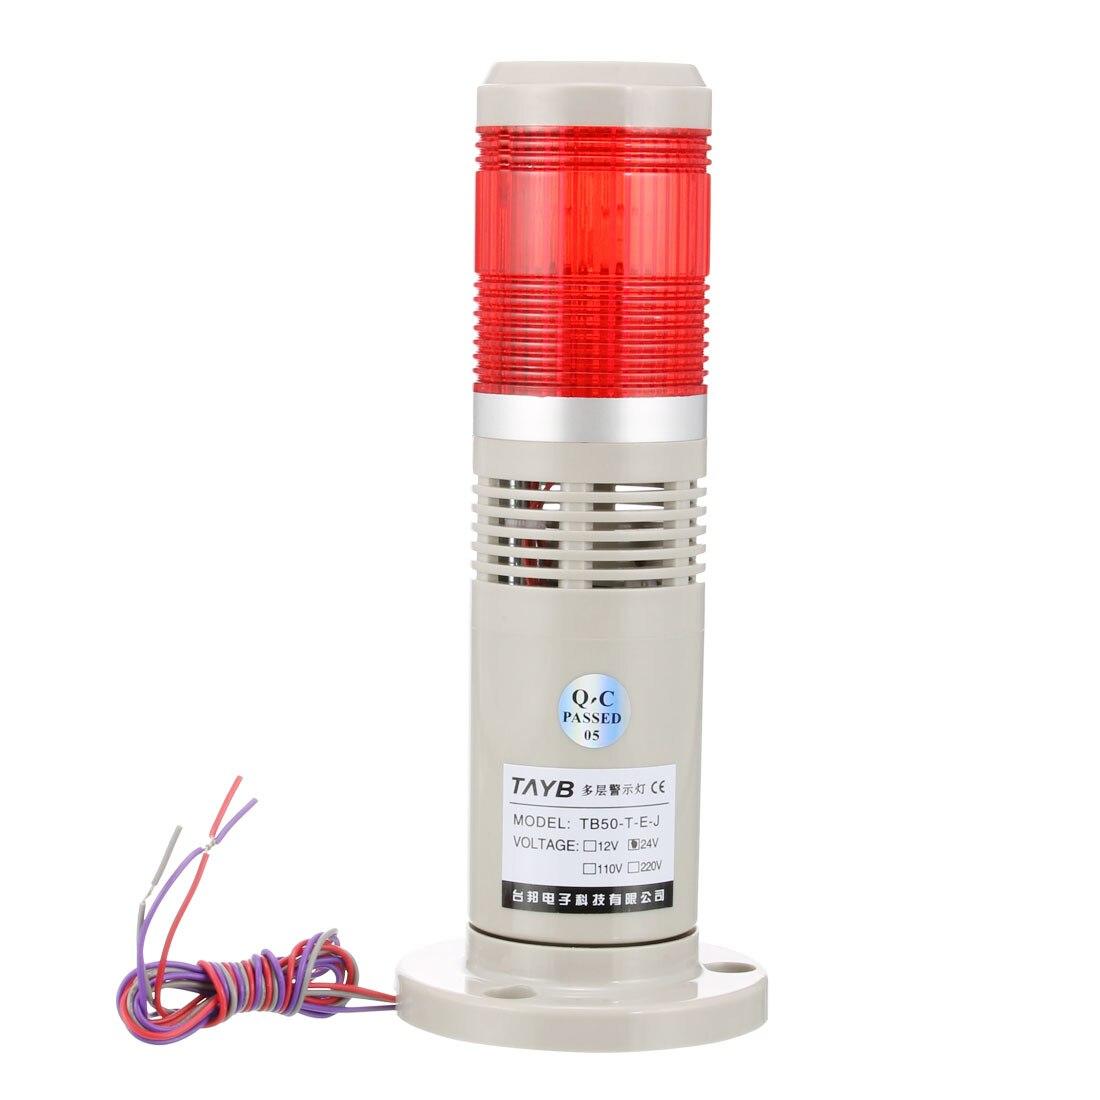 Uxcell luz de advertência brilhante sinal industrial torre alarme lâmpada buzzer som 90db TB50-1T-E-J